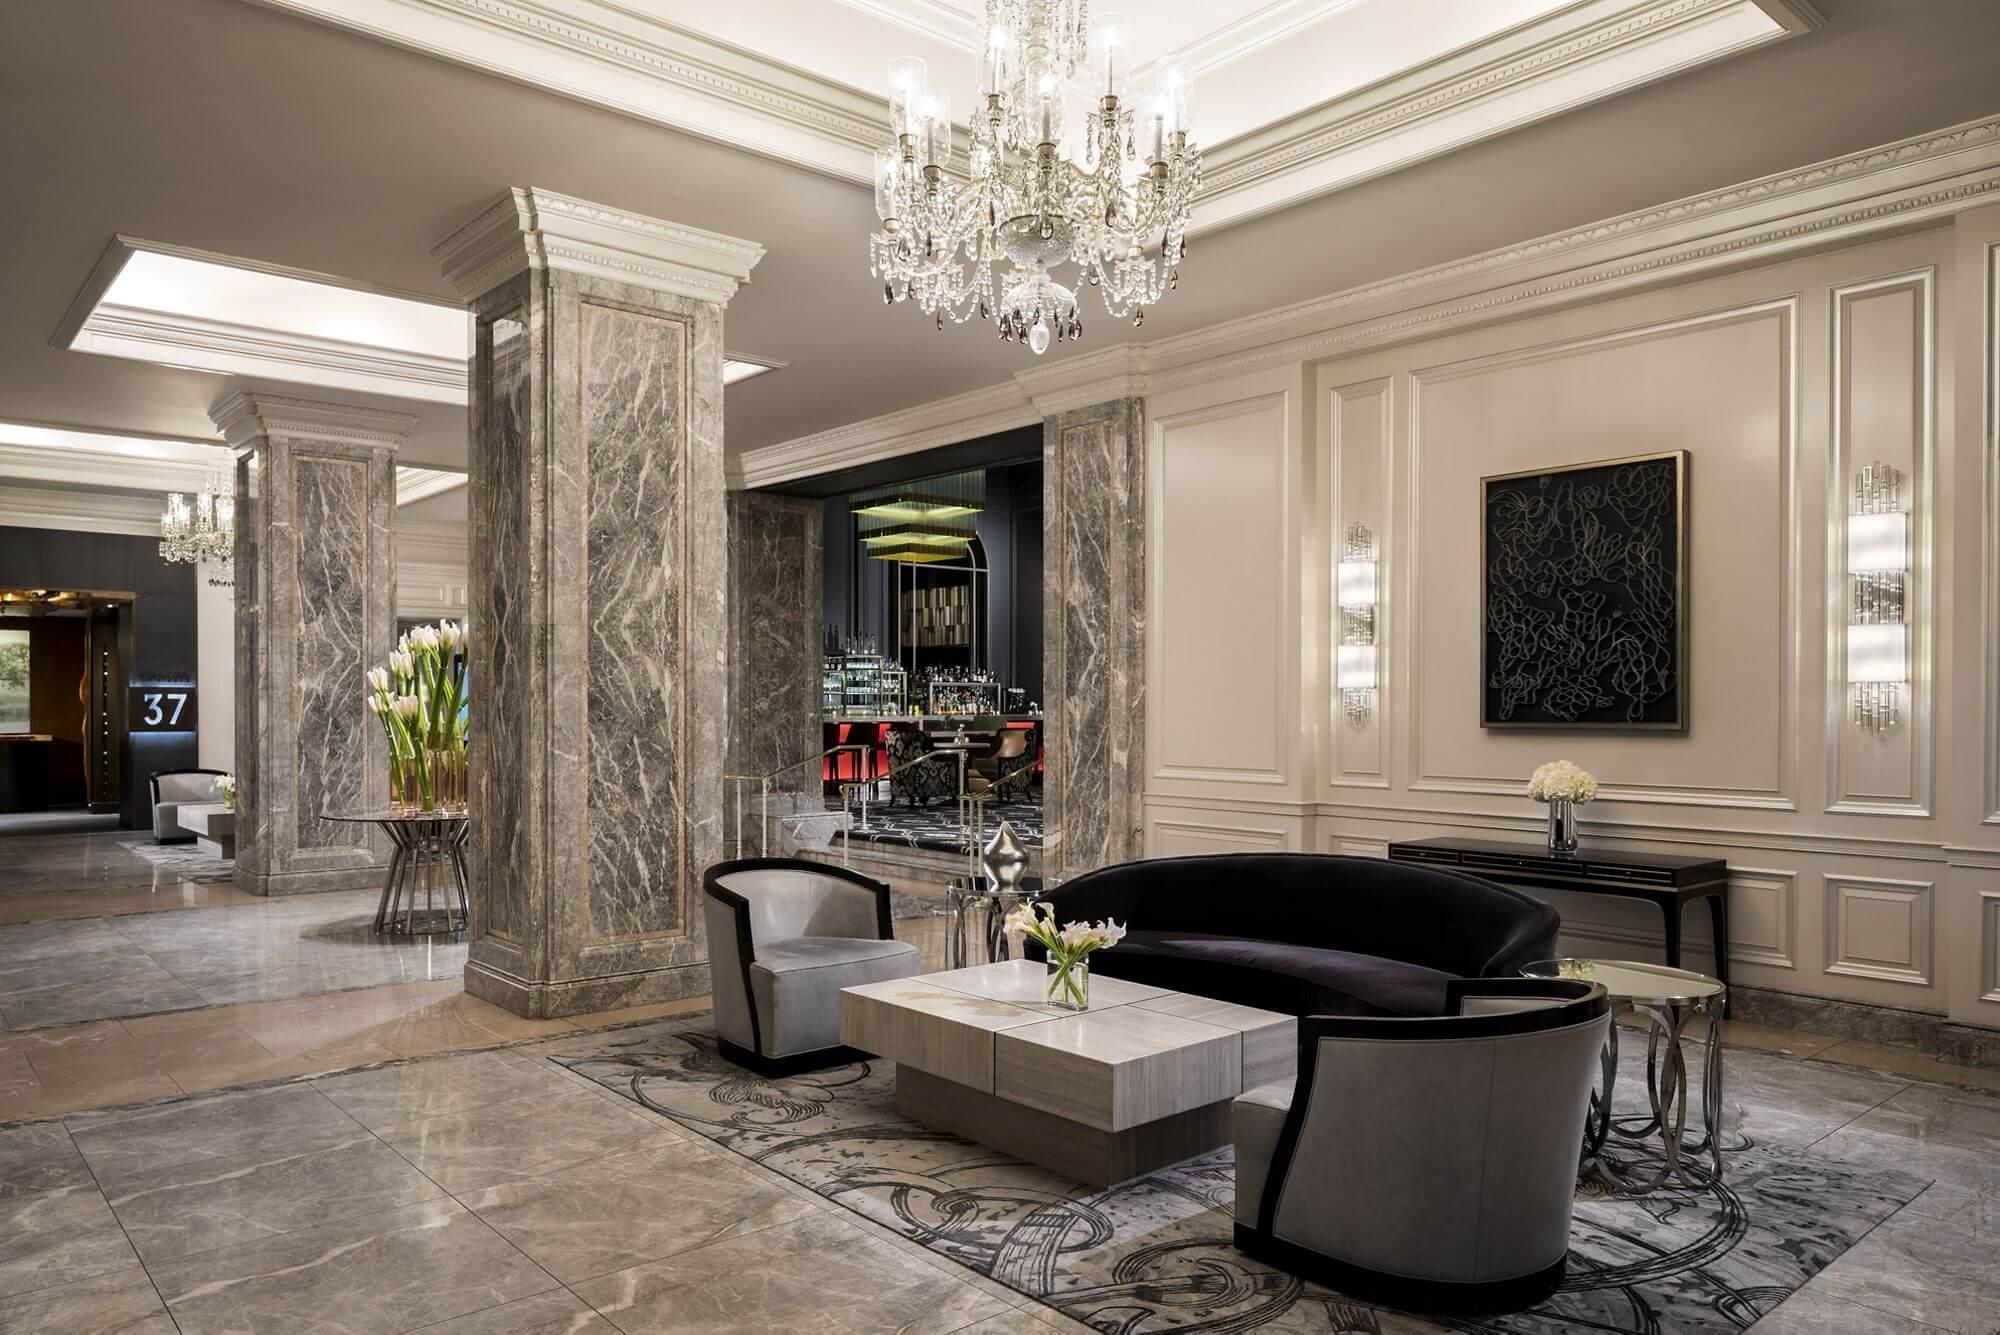 The Ritz Carlton San Francisco Lobby